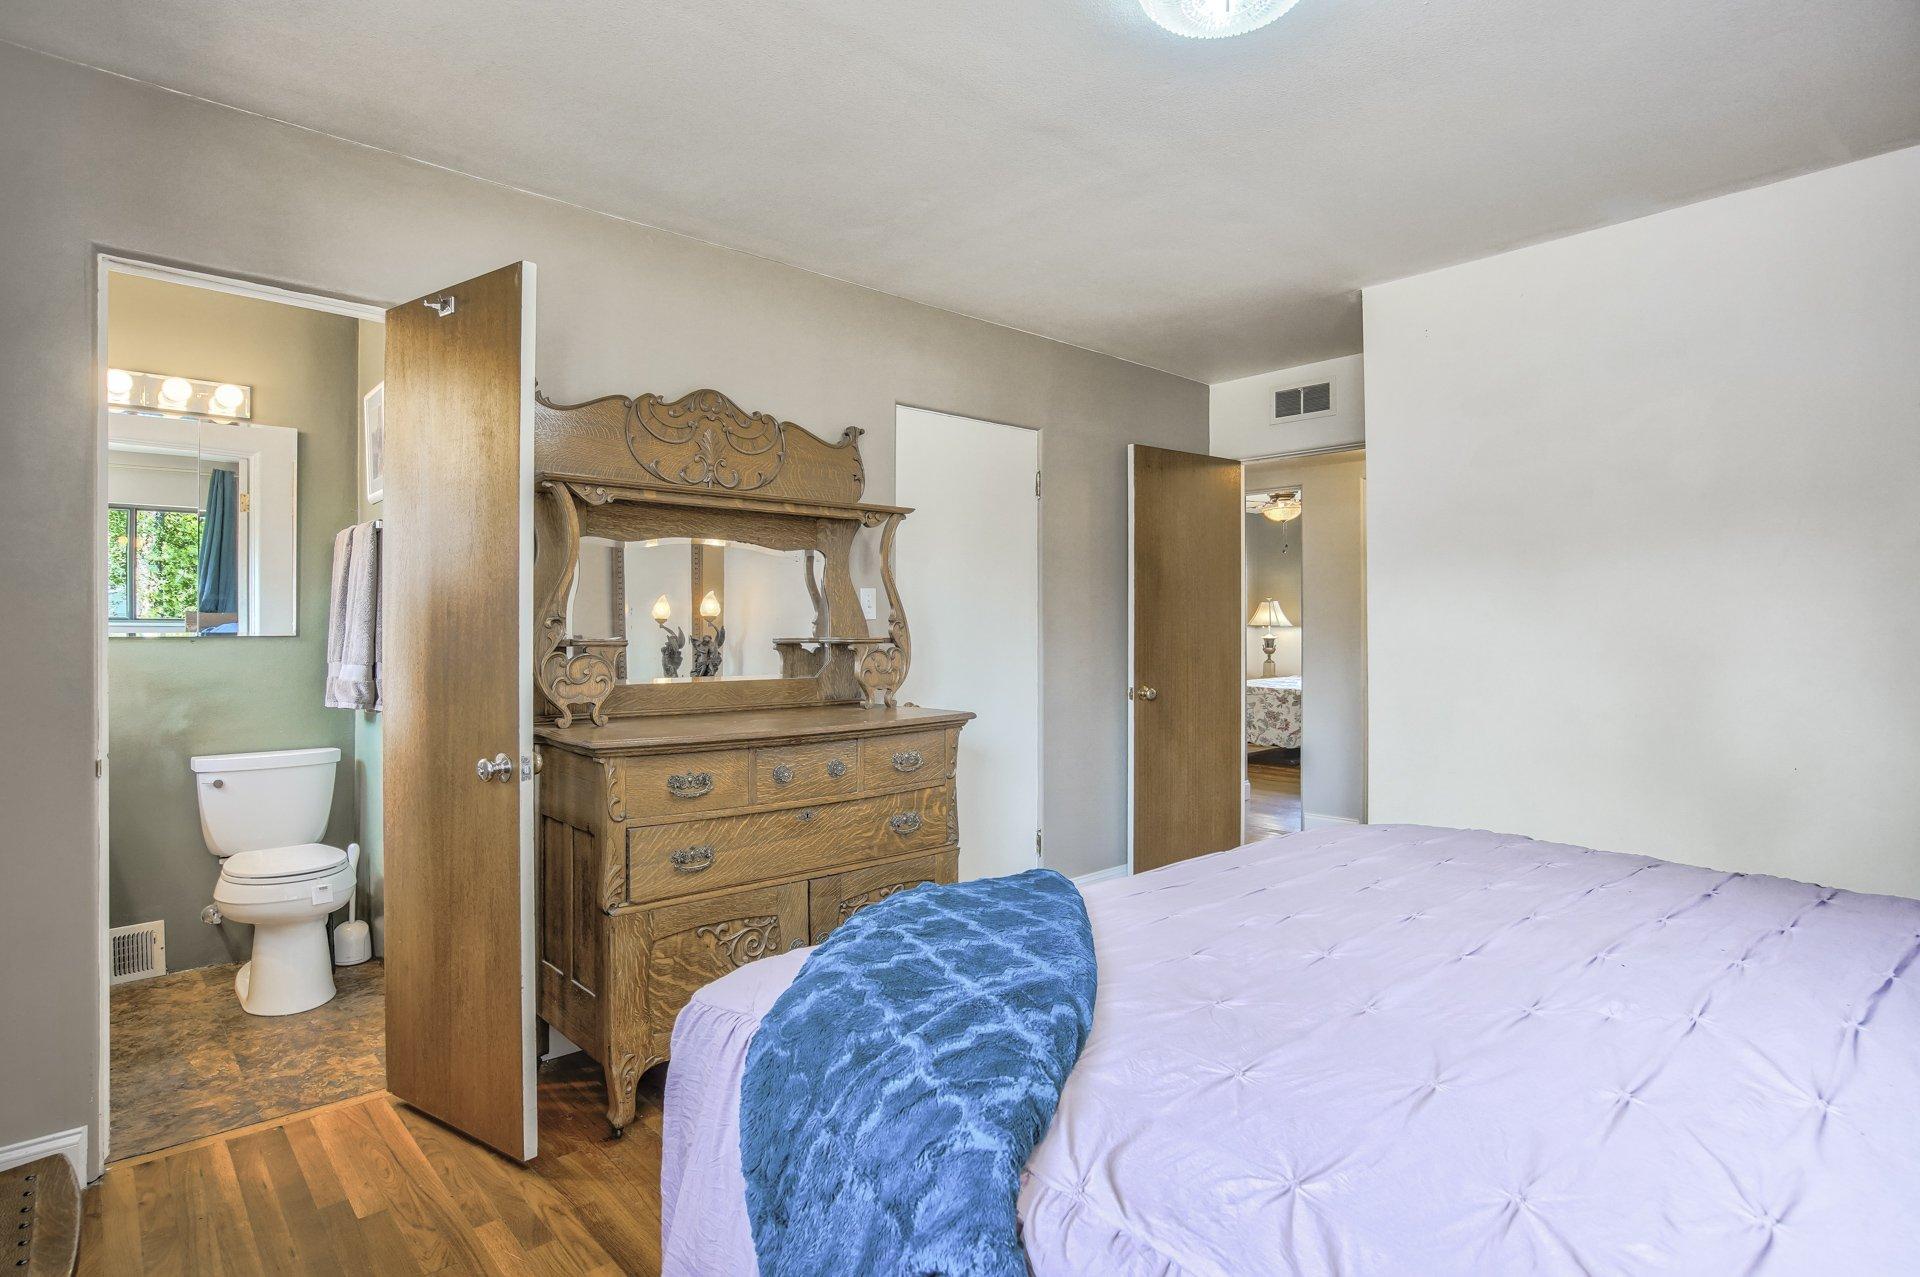 Bed and dresser looking toward bathroom